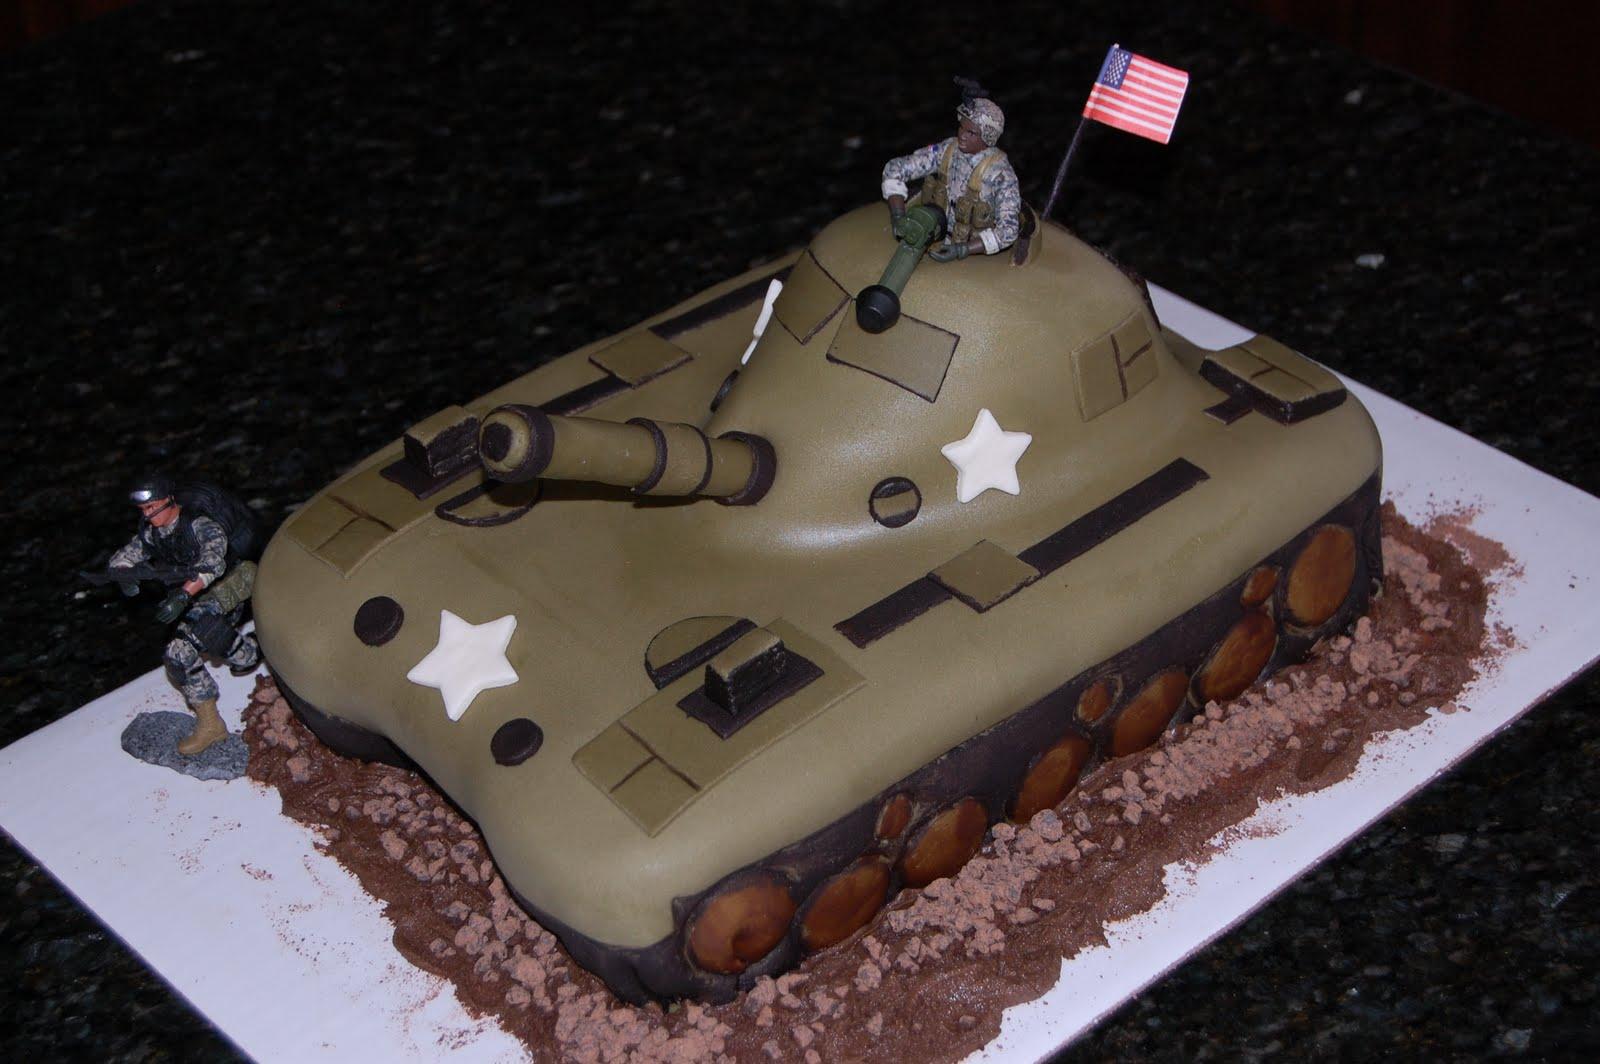 MKHKKH US Tank Cake